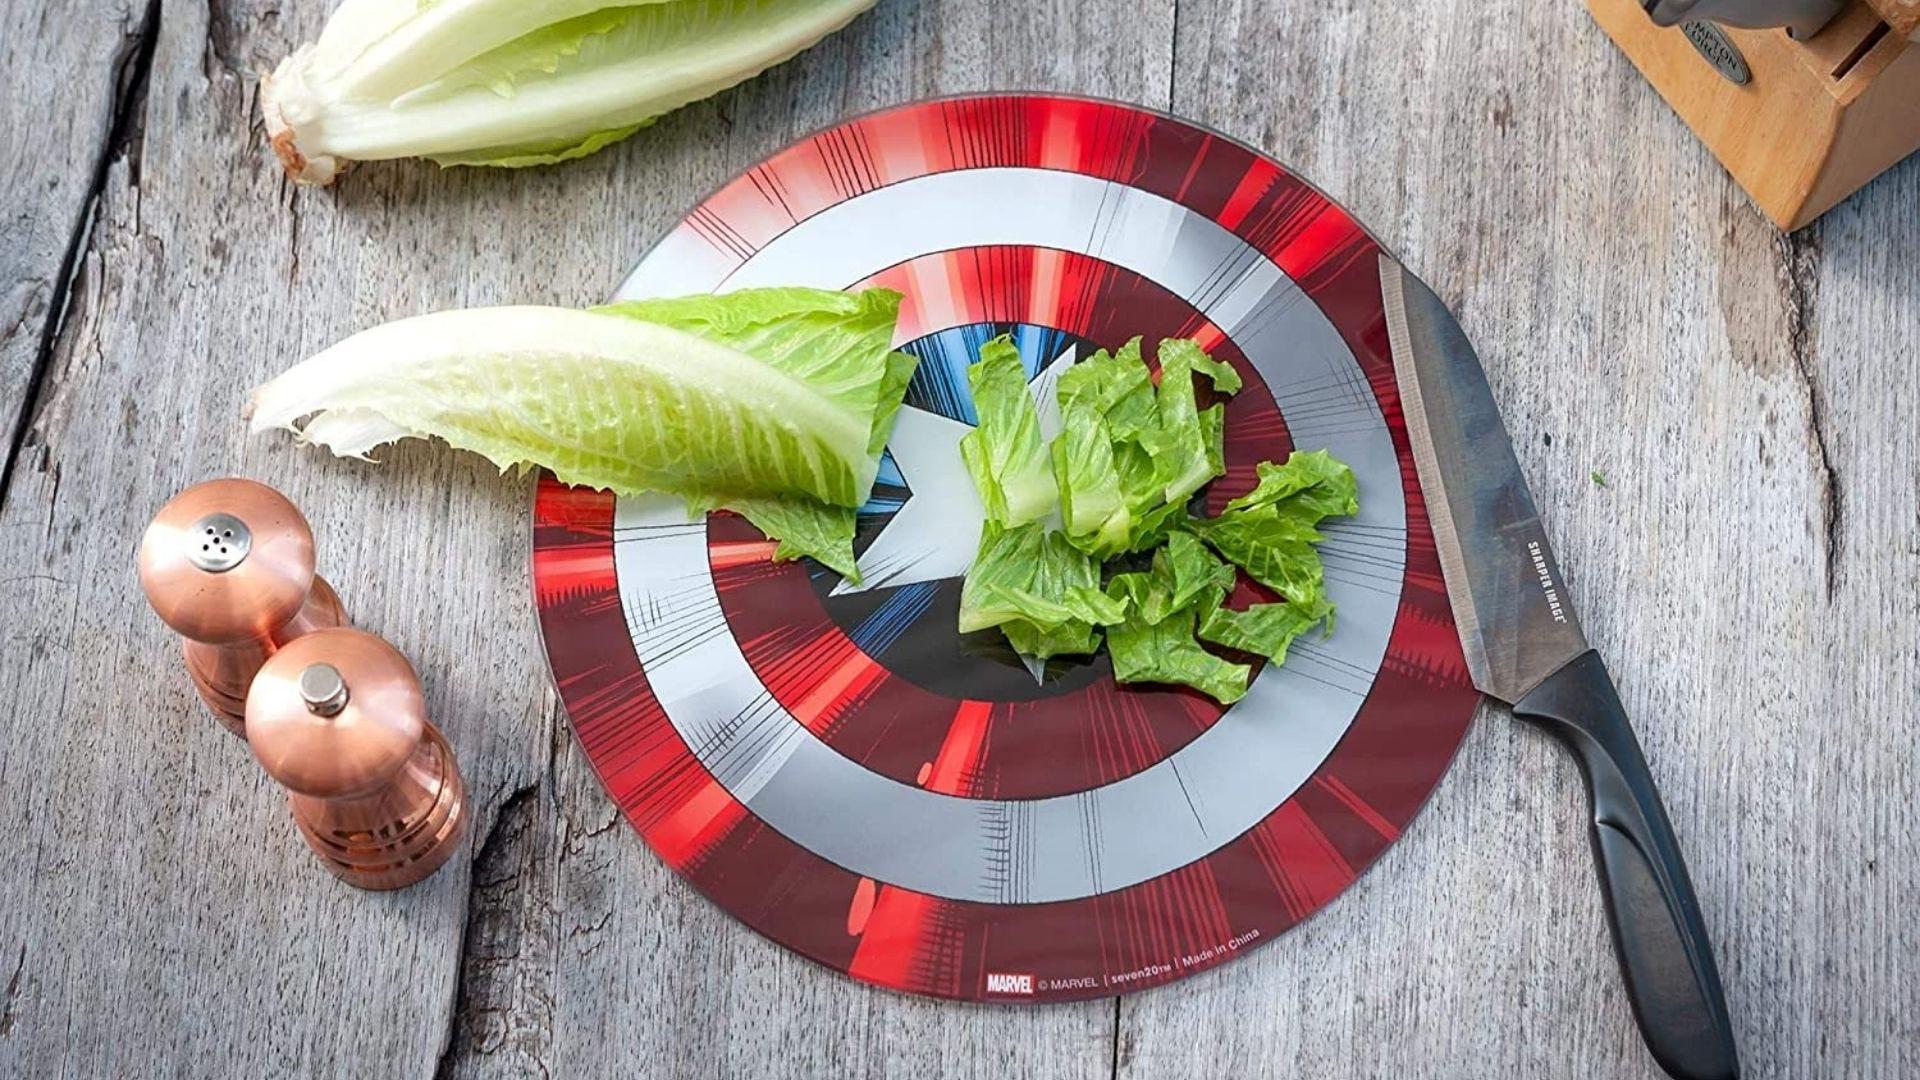 A cutting board shaped like Captain America's shield